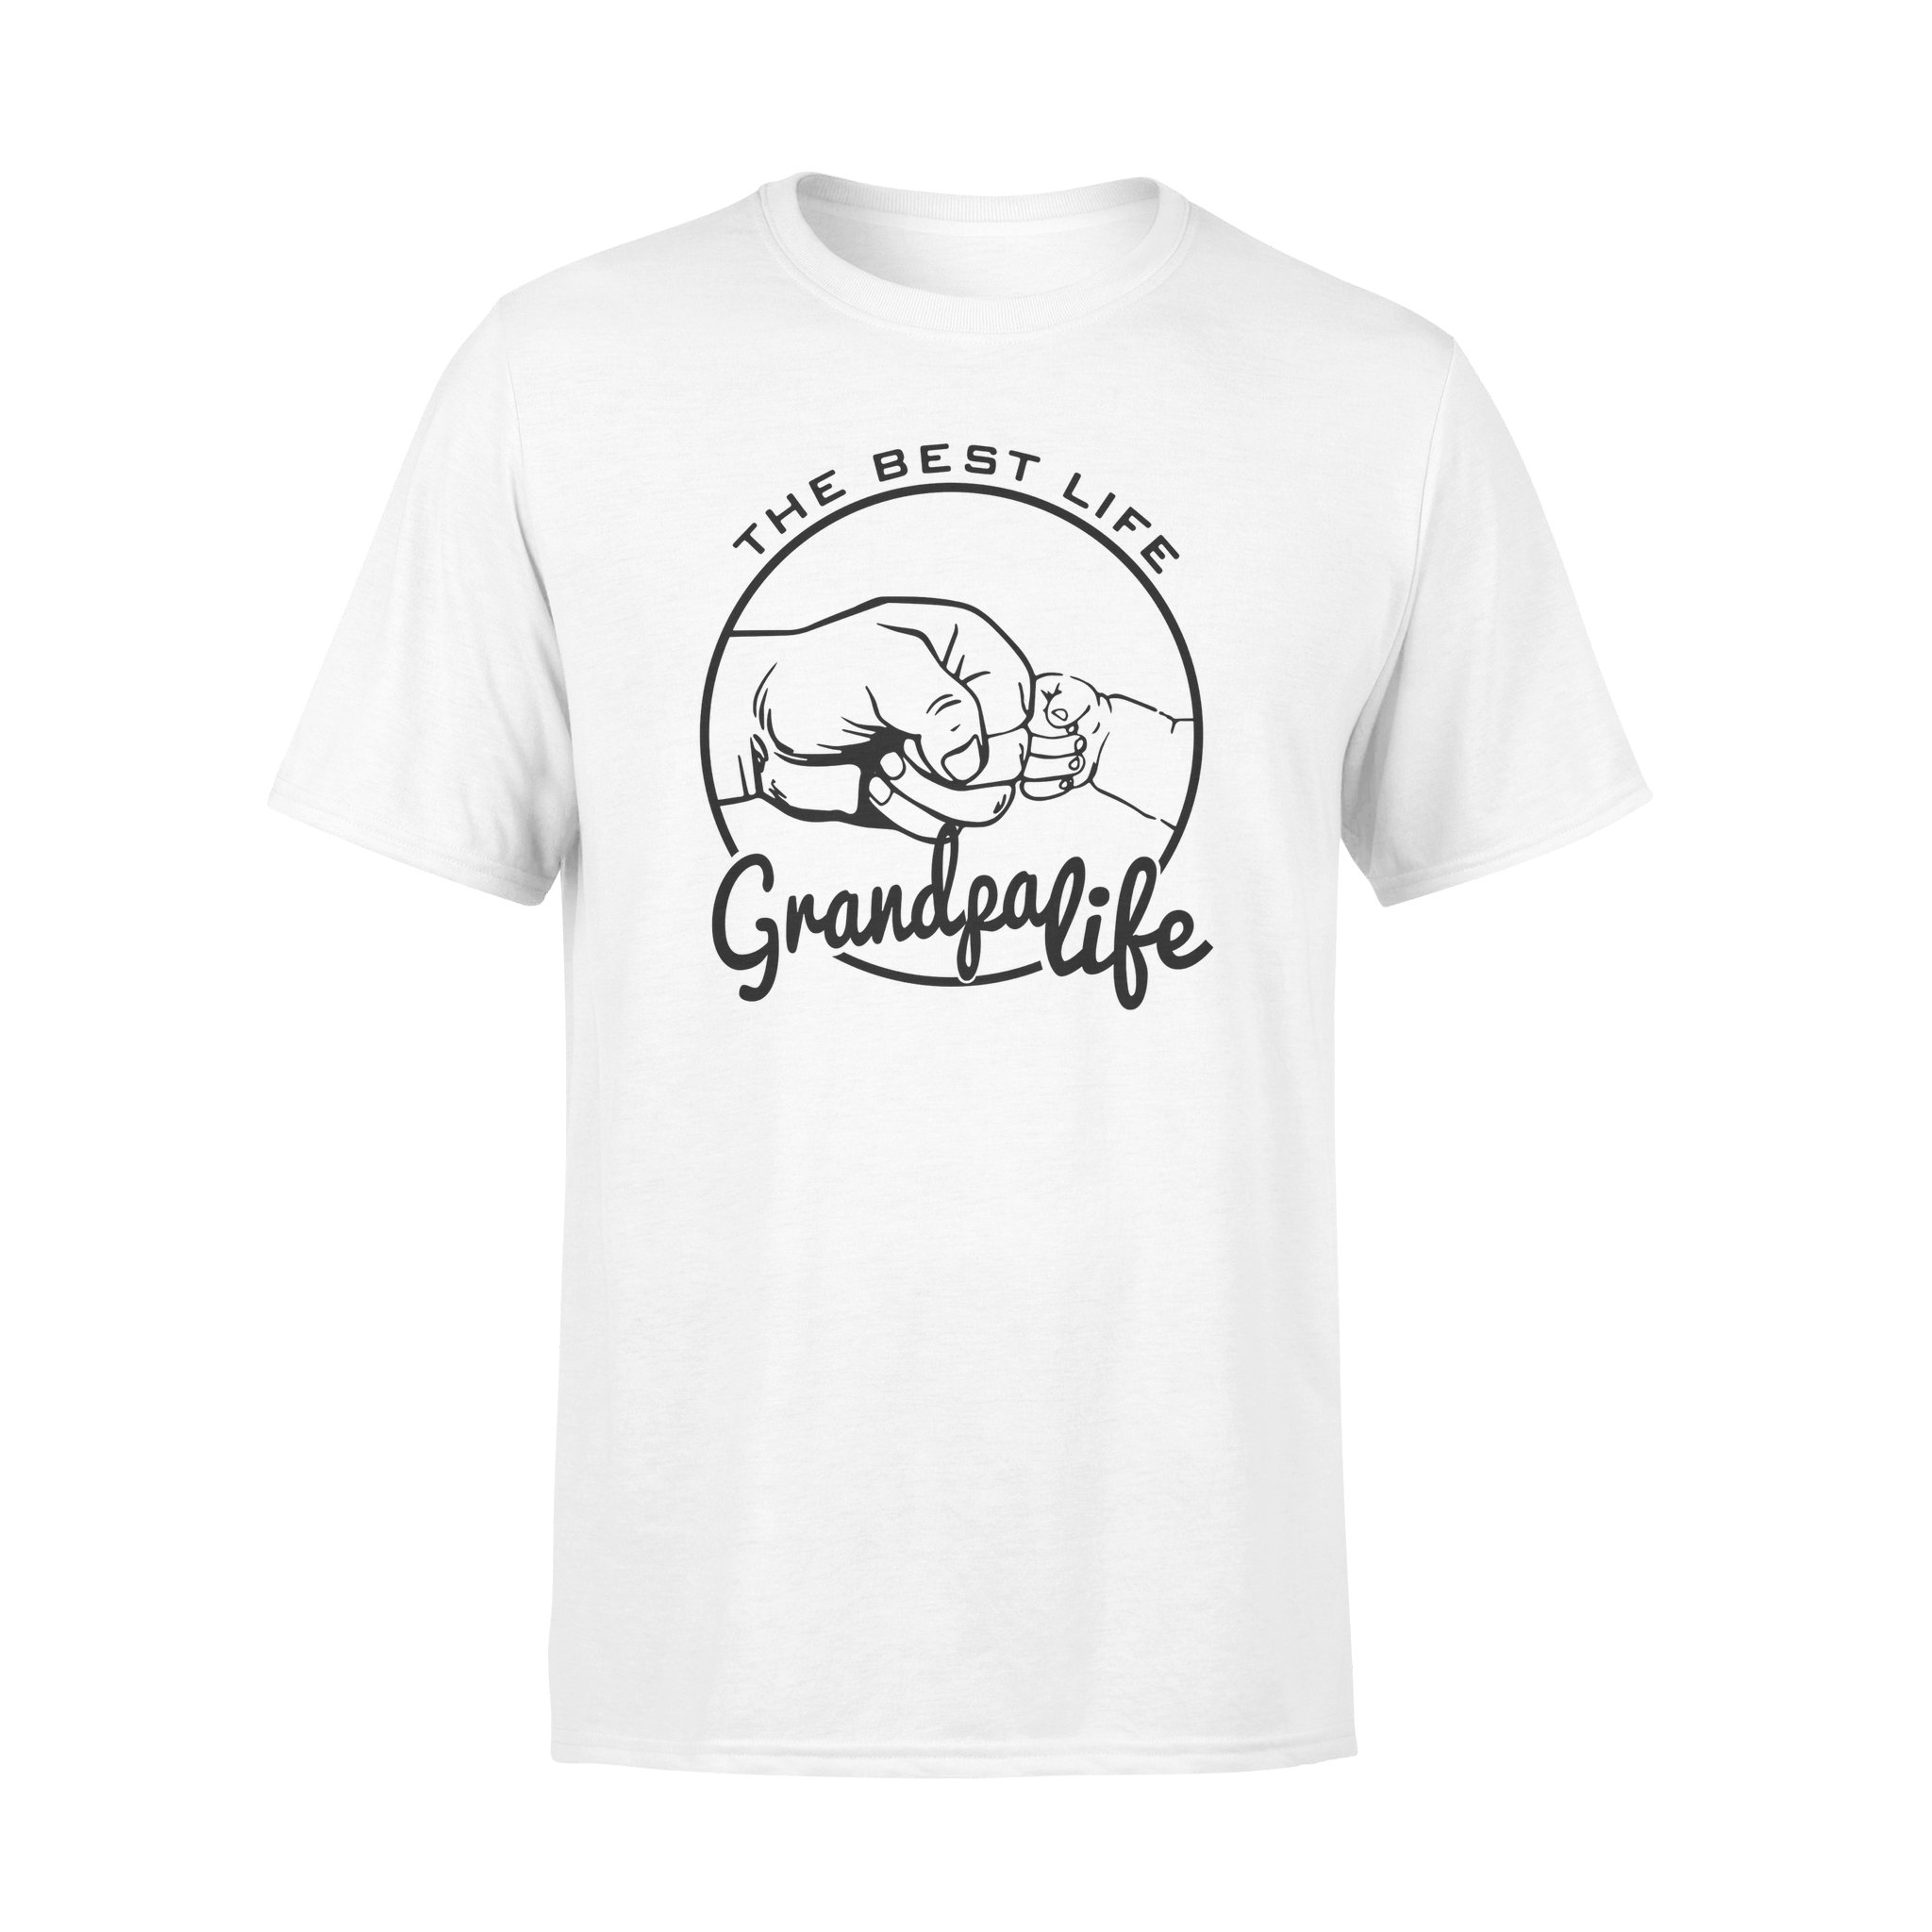 grandpa life T shirt - Gifts for grandpa